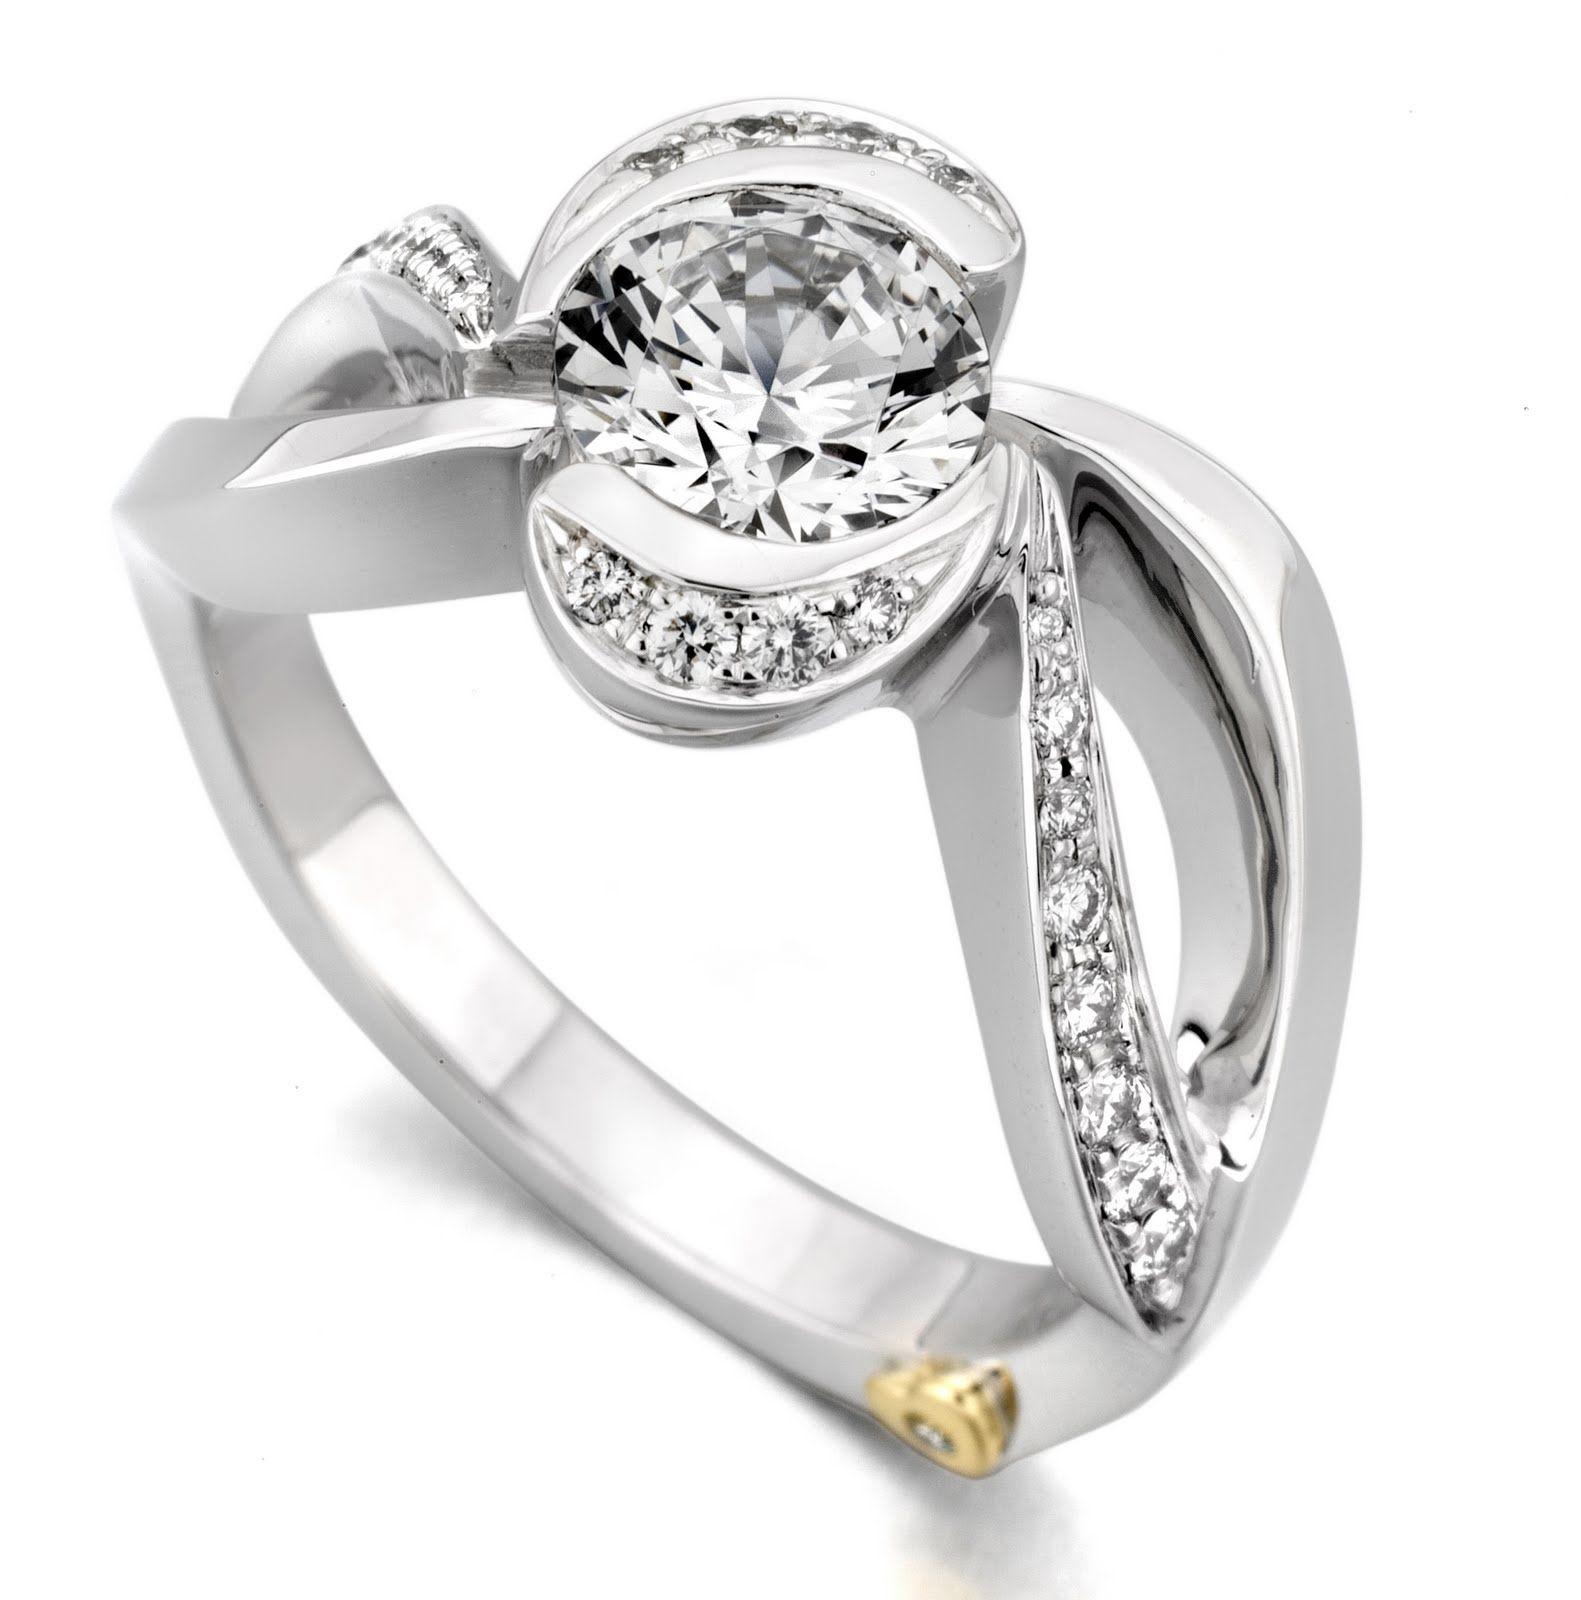 design a Diamond Ring At Kruckemeyer and Cohn http